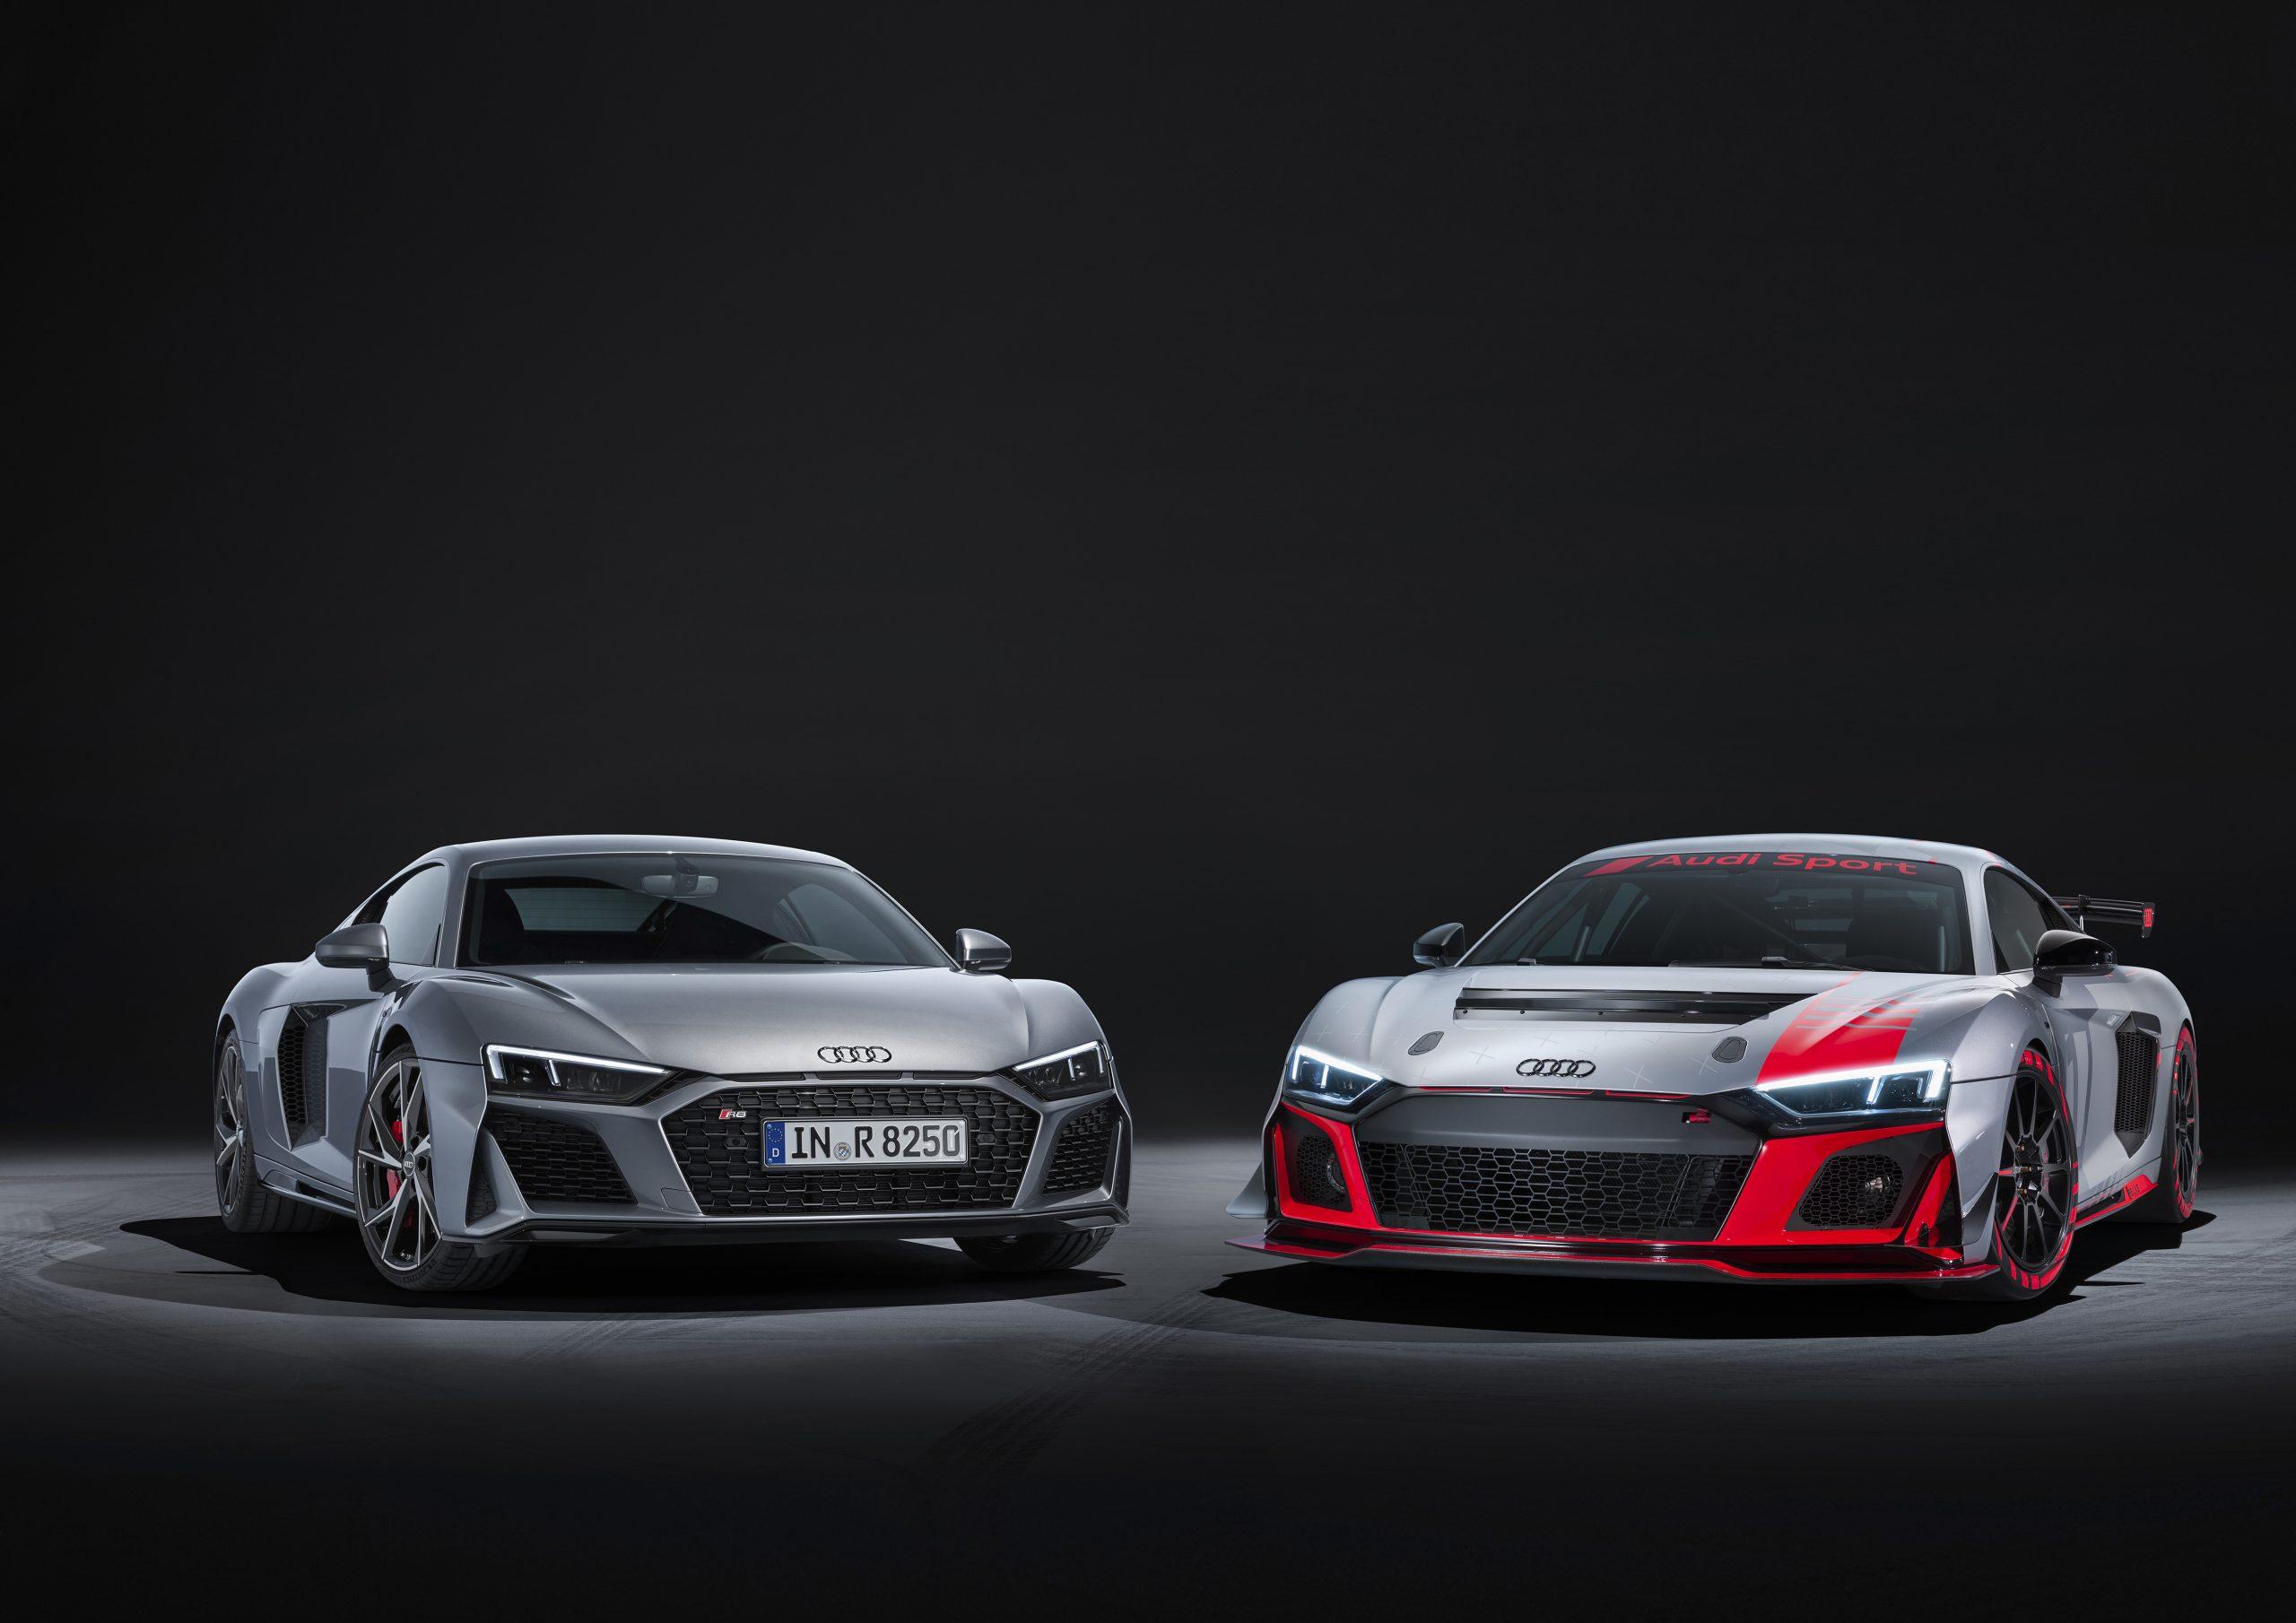 Audi R8 V10 RWD and Audi R8 LMS GT4